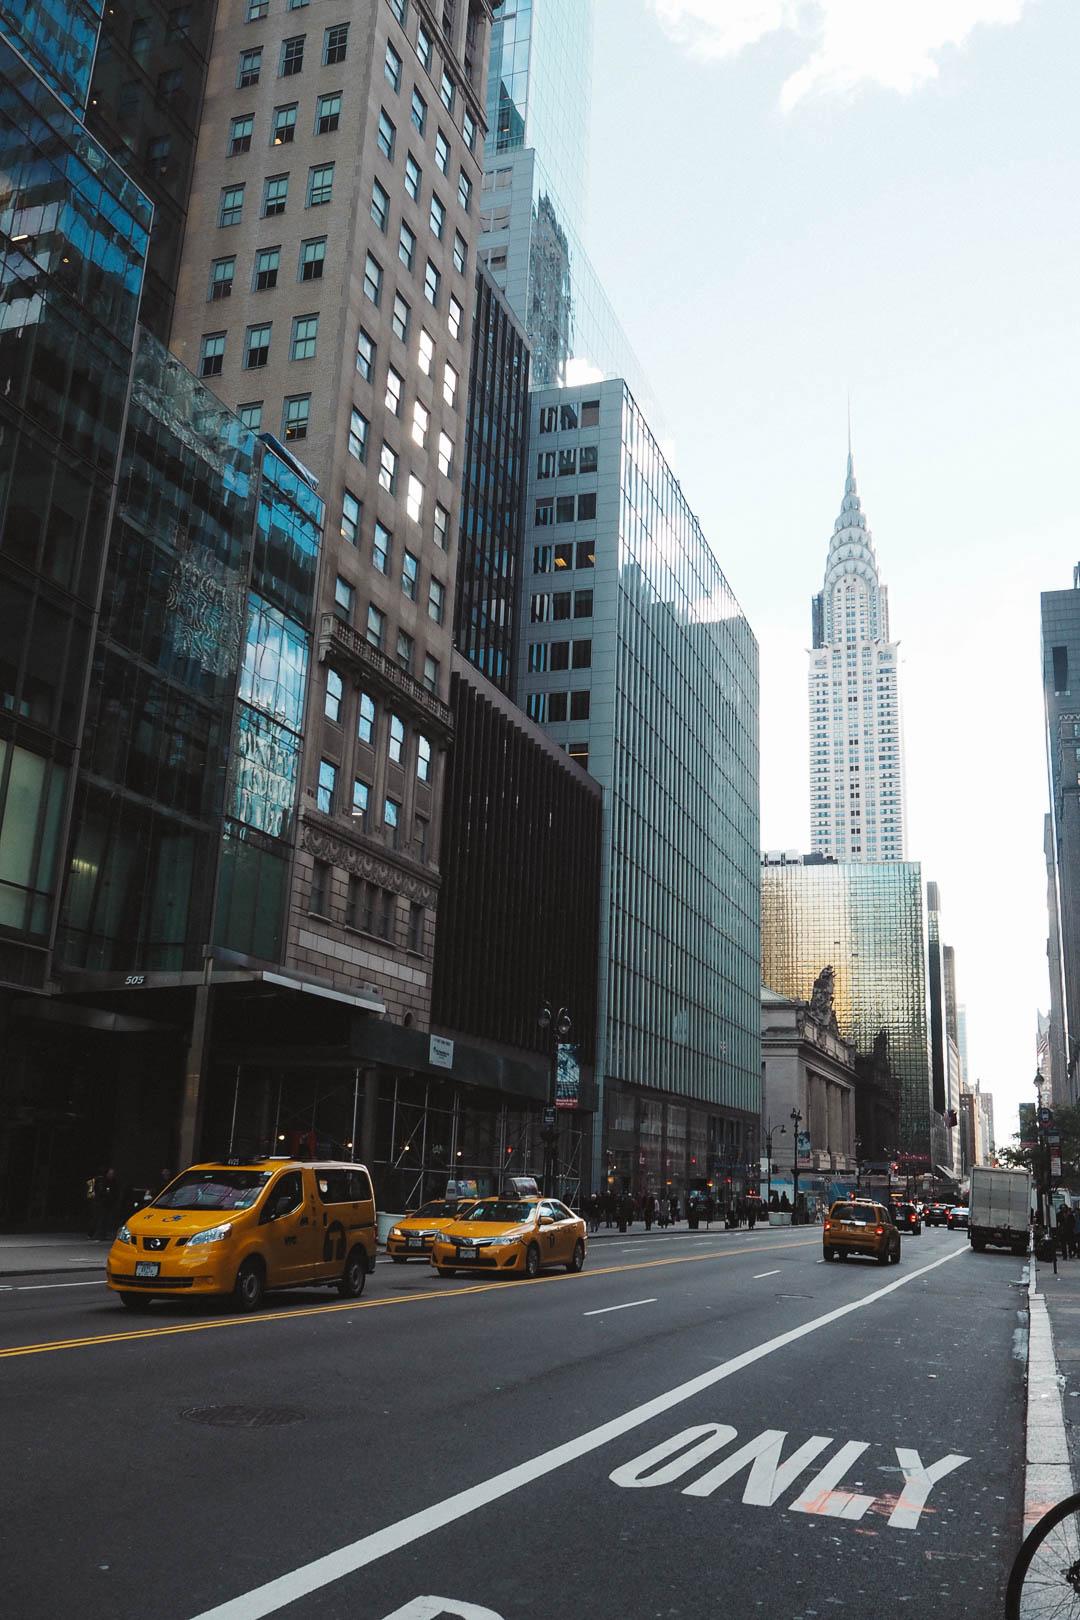 newyork-4-of-171